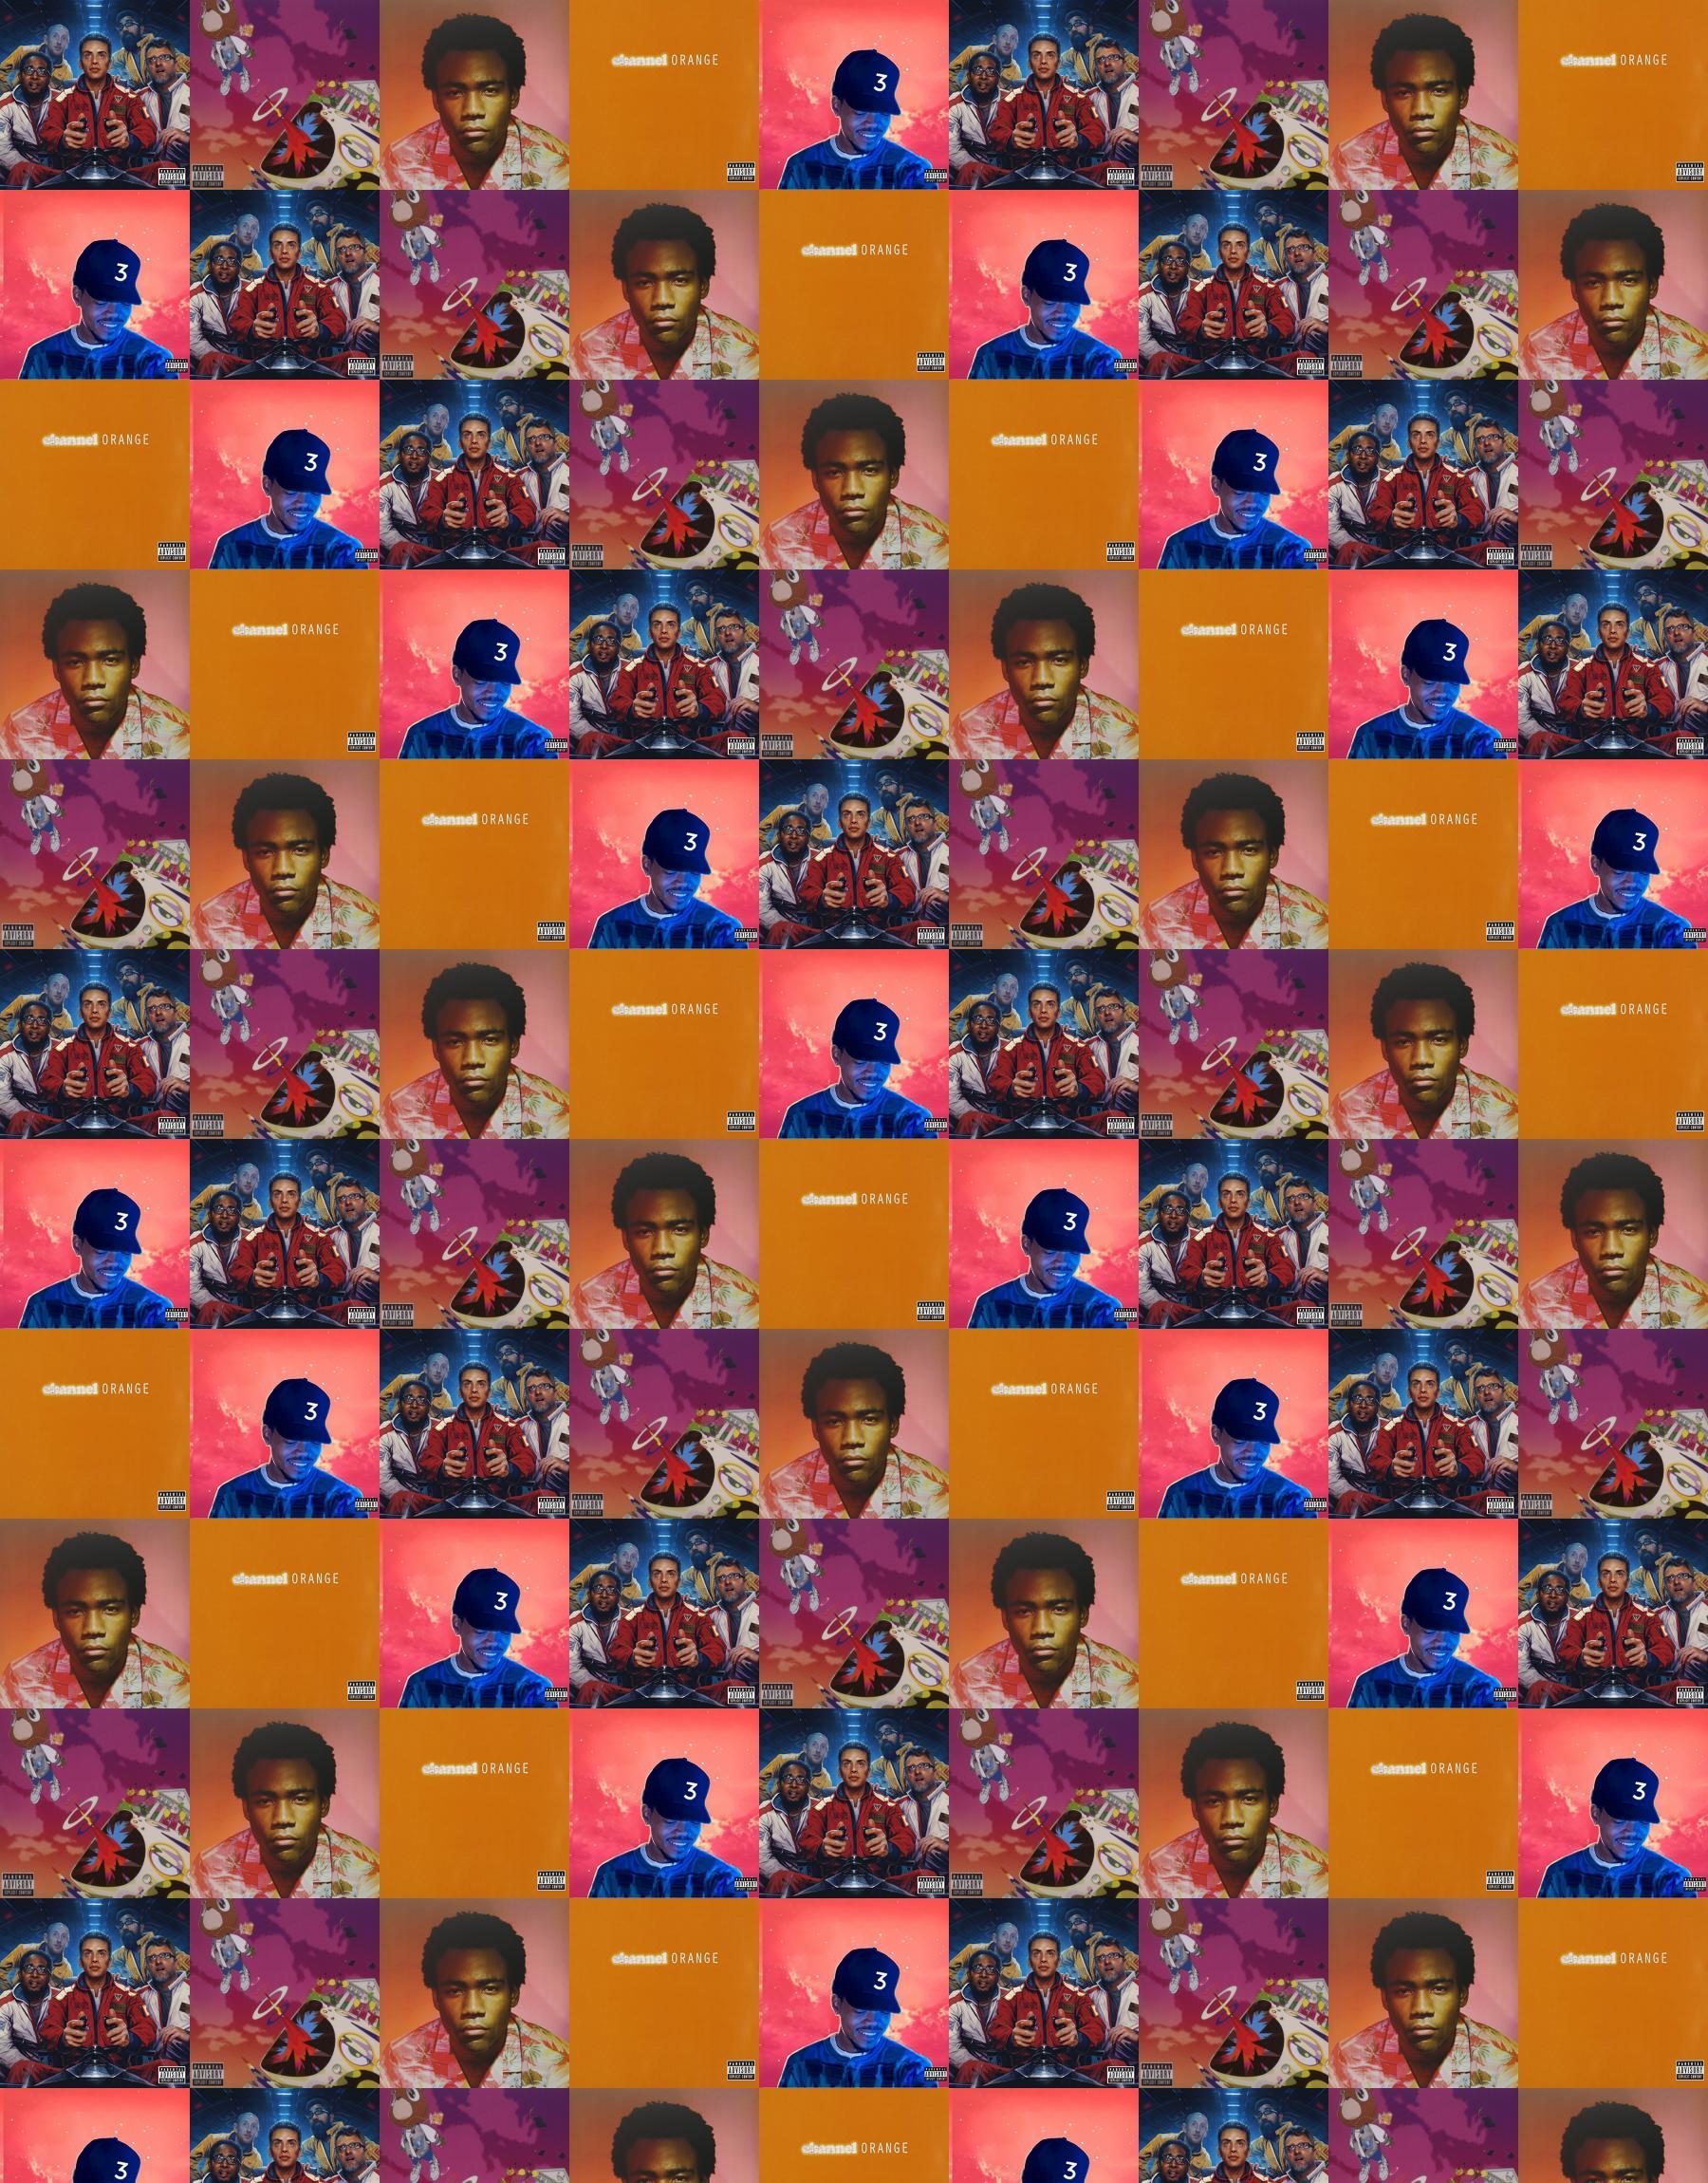 Logic The Incredible True Story Kanye Graduation Childish Wallpaper Tiled Desktop